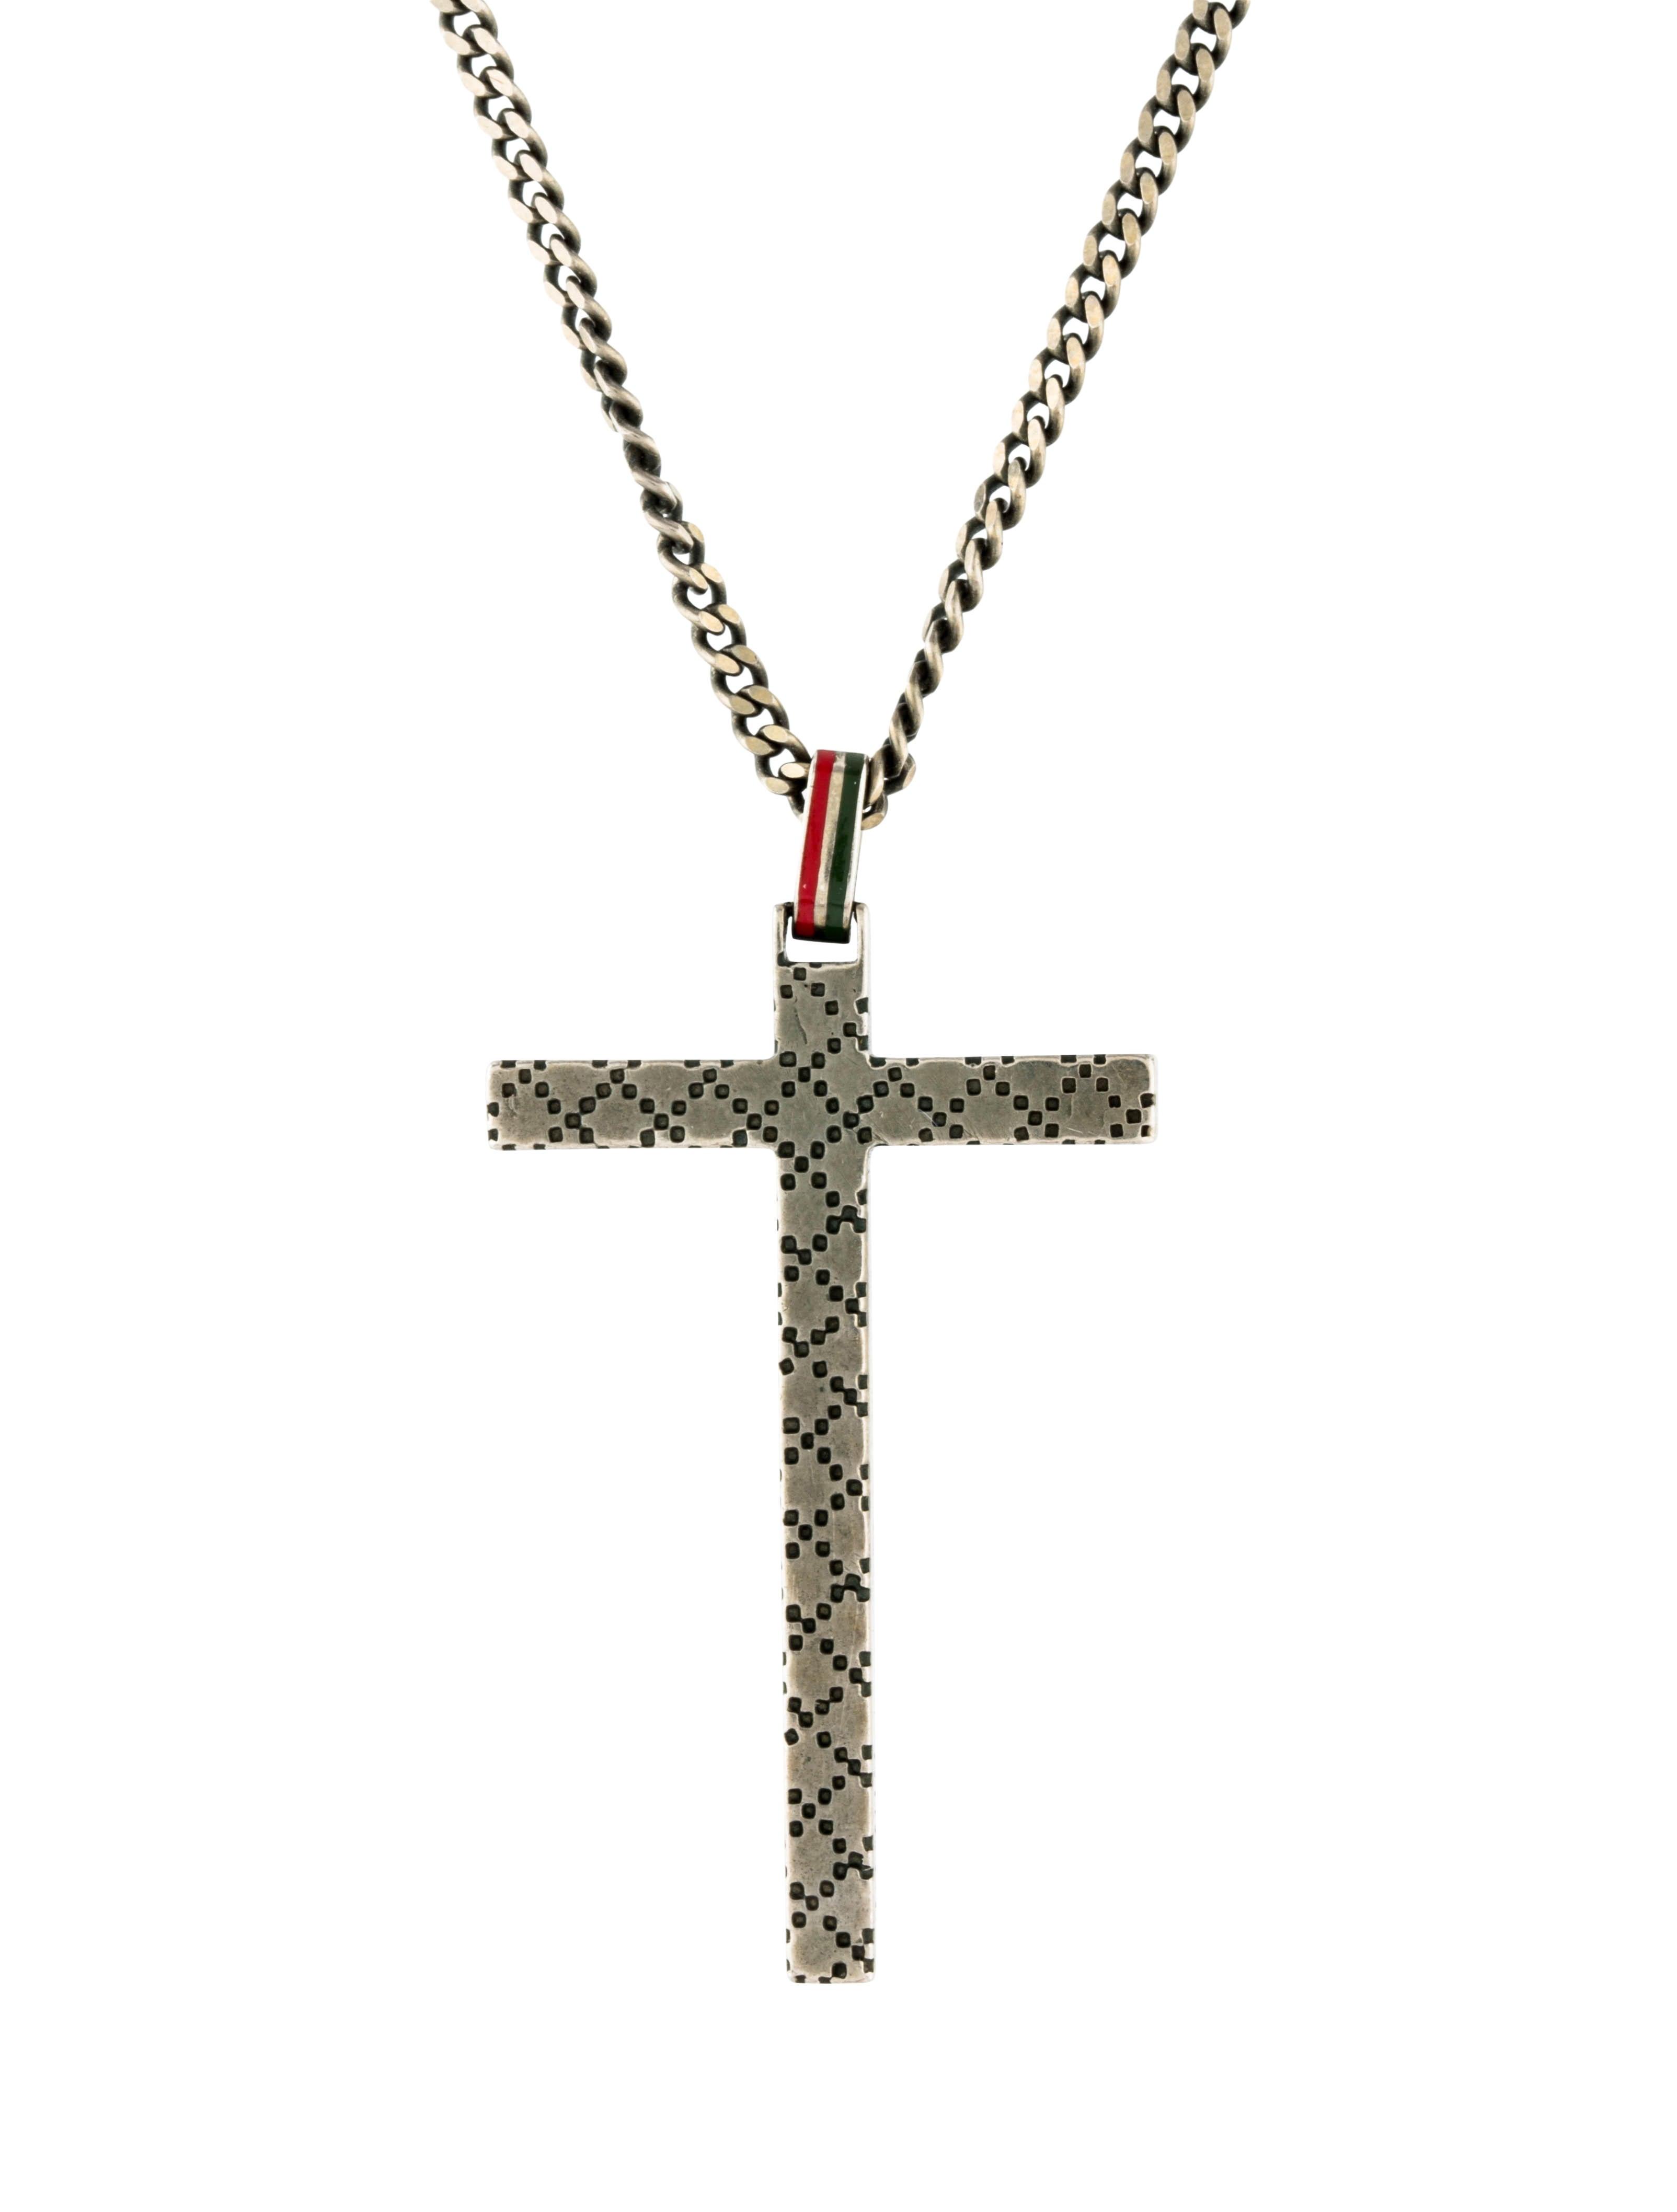 a7c2cb13b29 Gucci Enamel Diamante Cross Pendant Necklace - Necklaces - GUC246162 ...